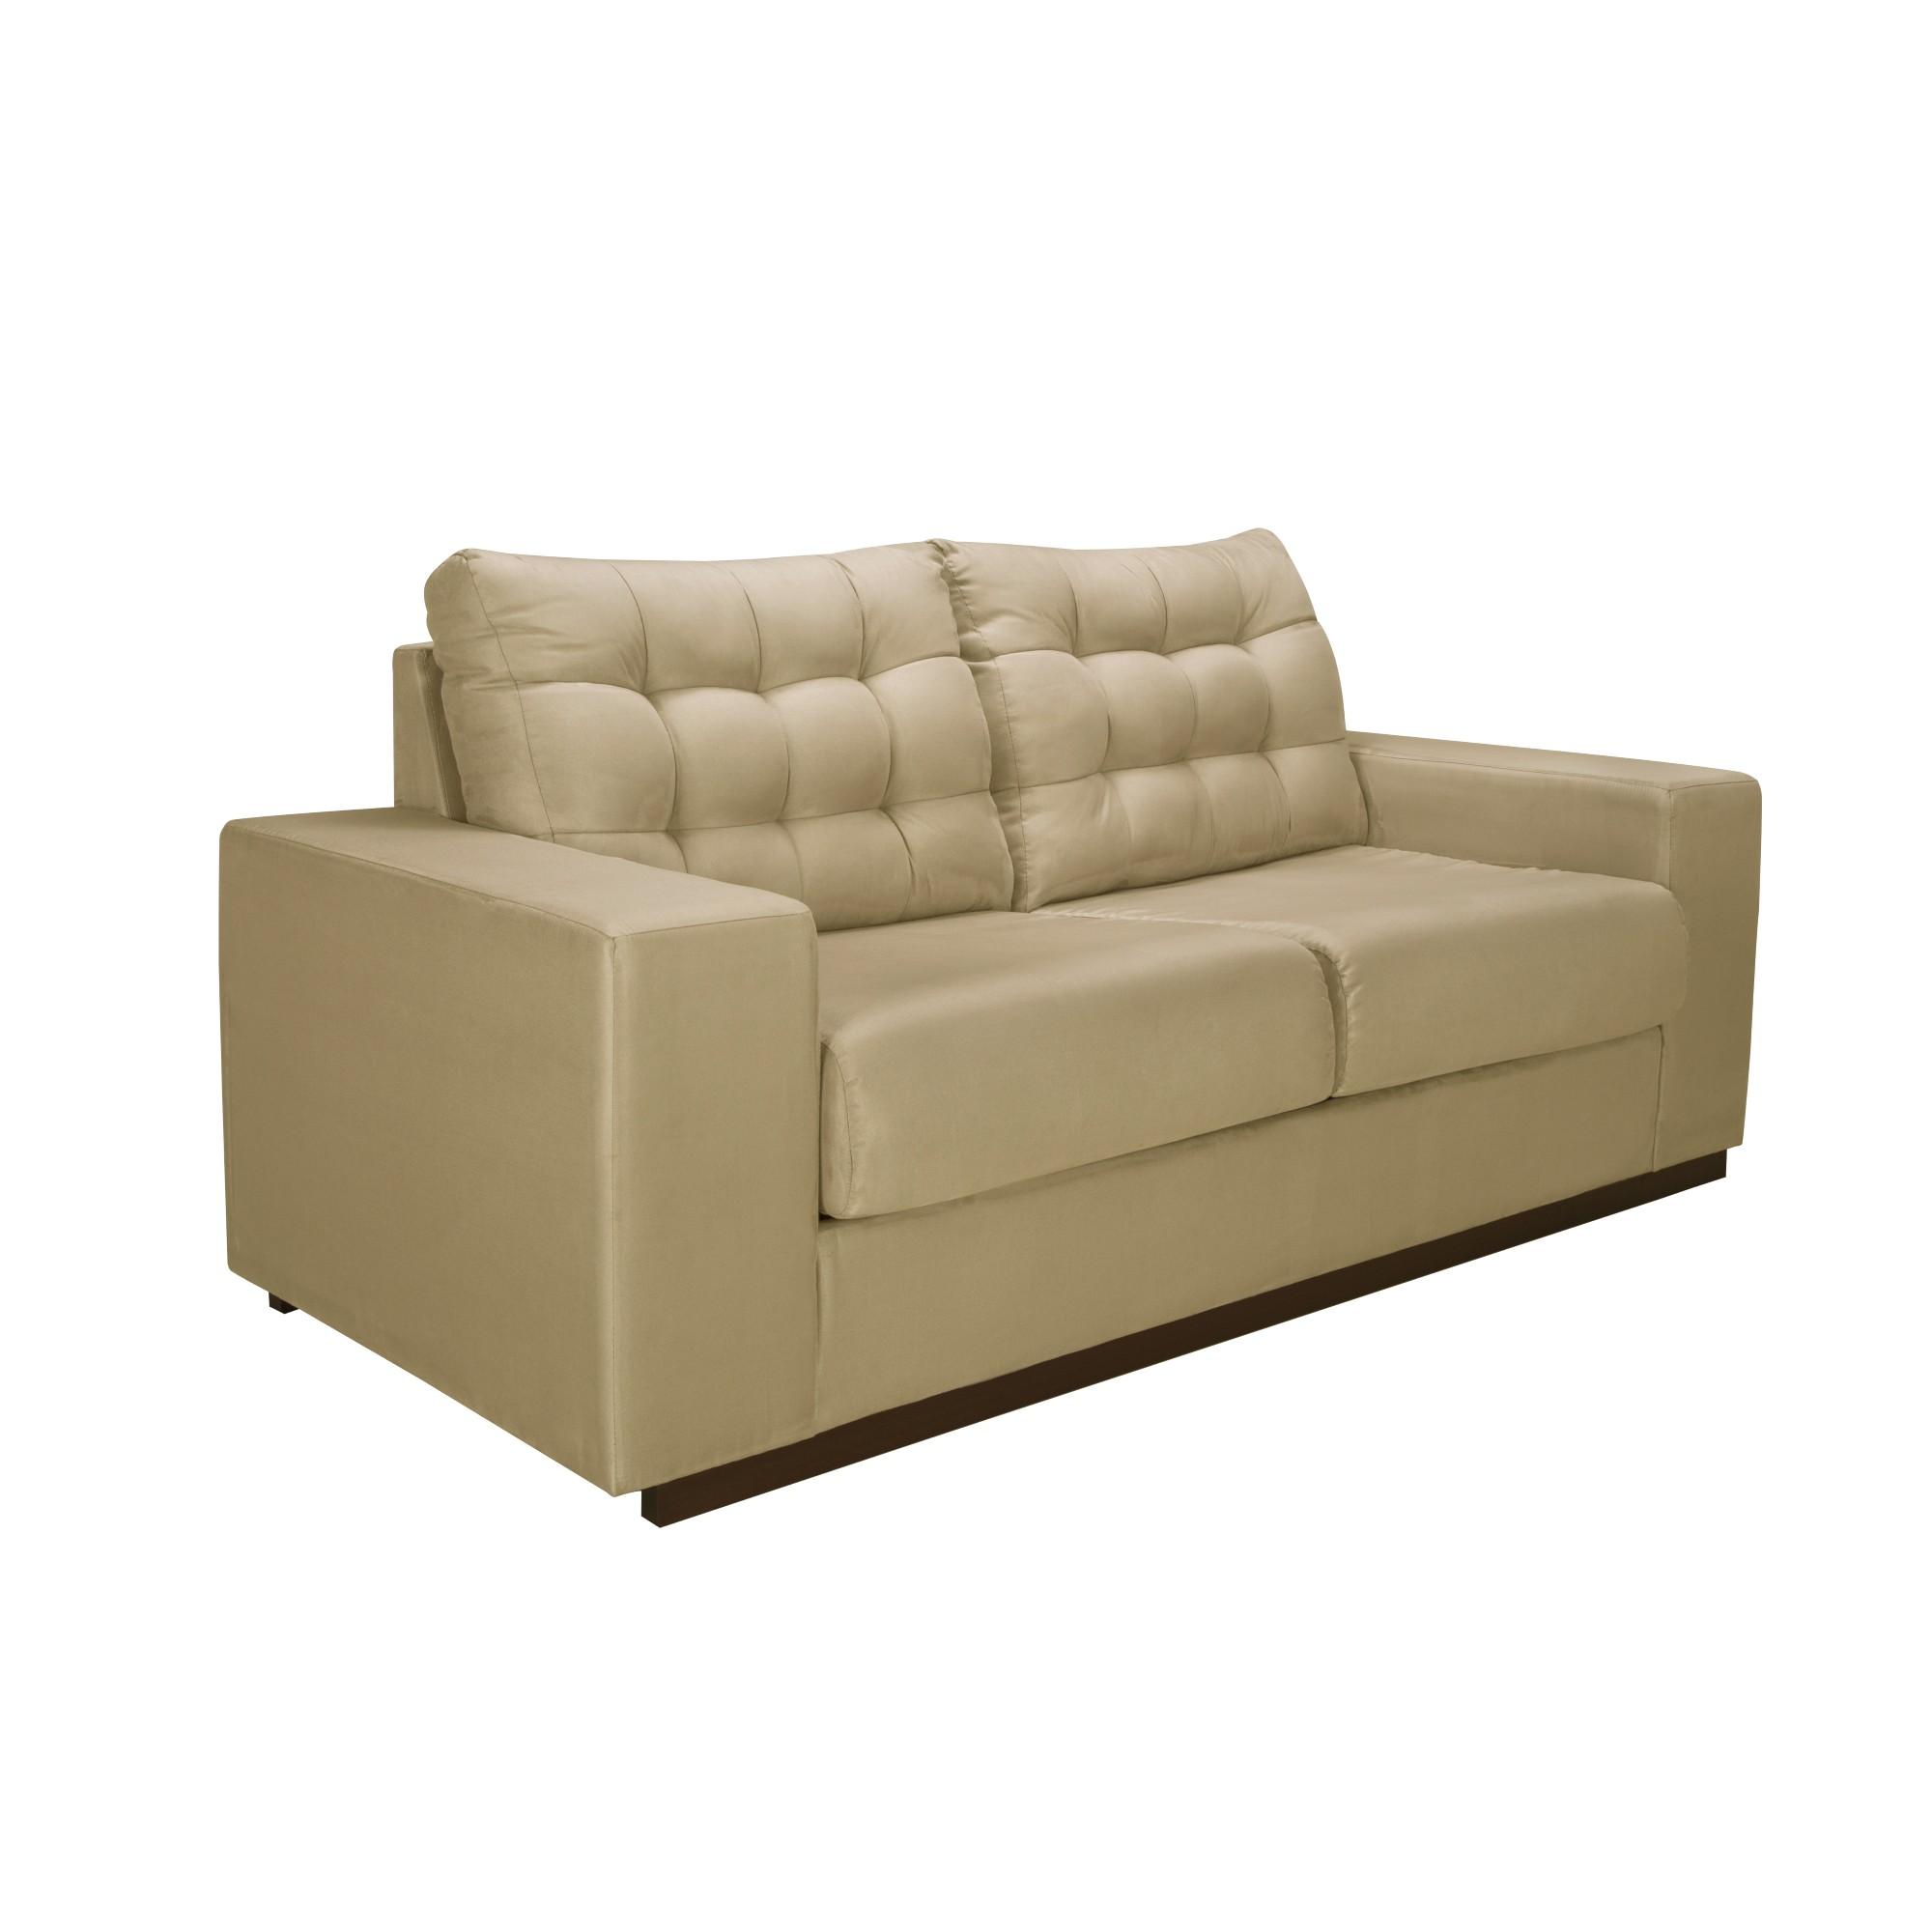 Sofa 2 Lugares Veludo 173x91x93 Bege - Herval